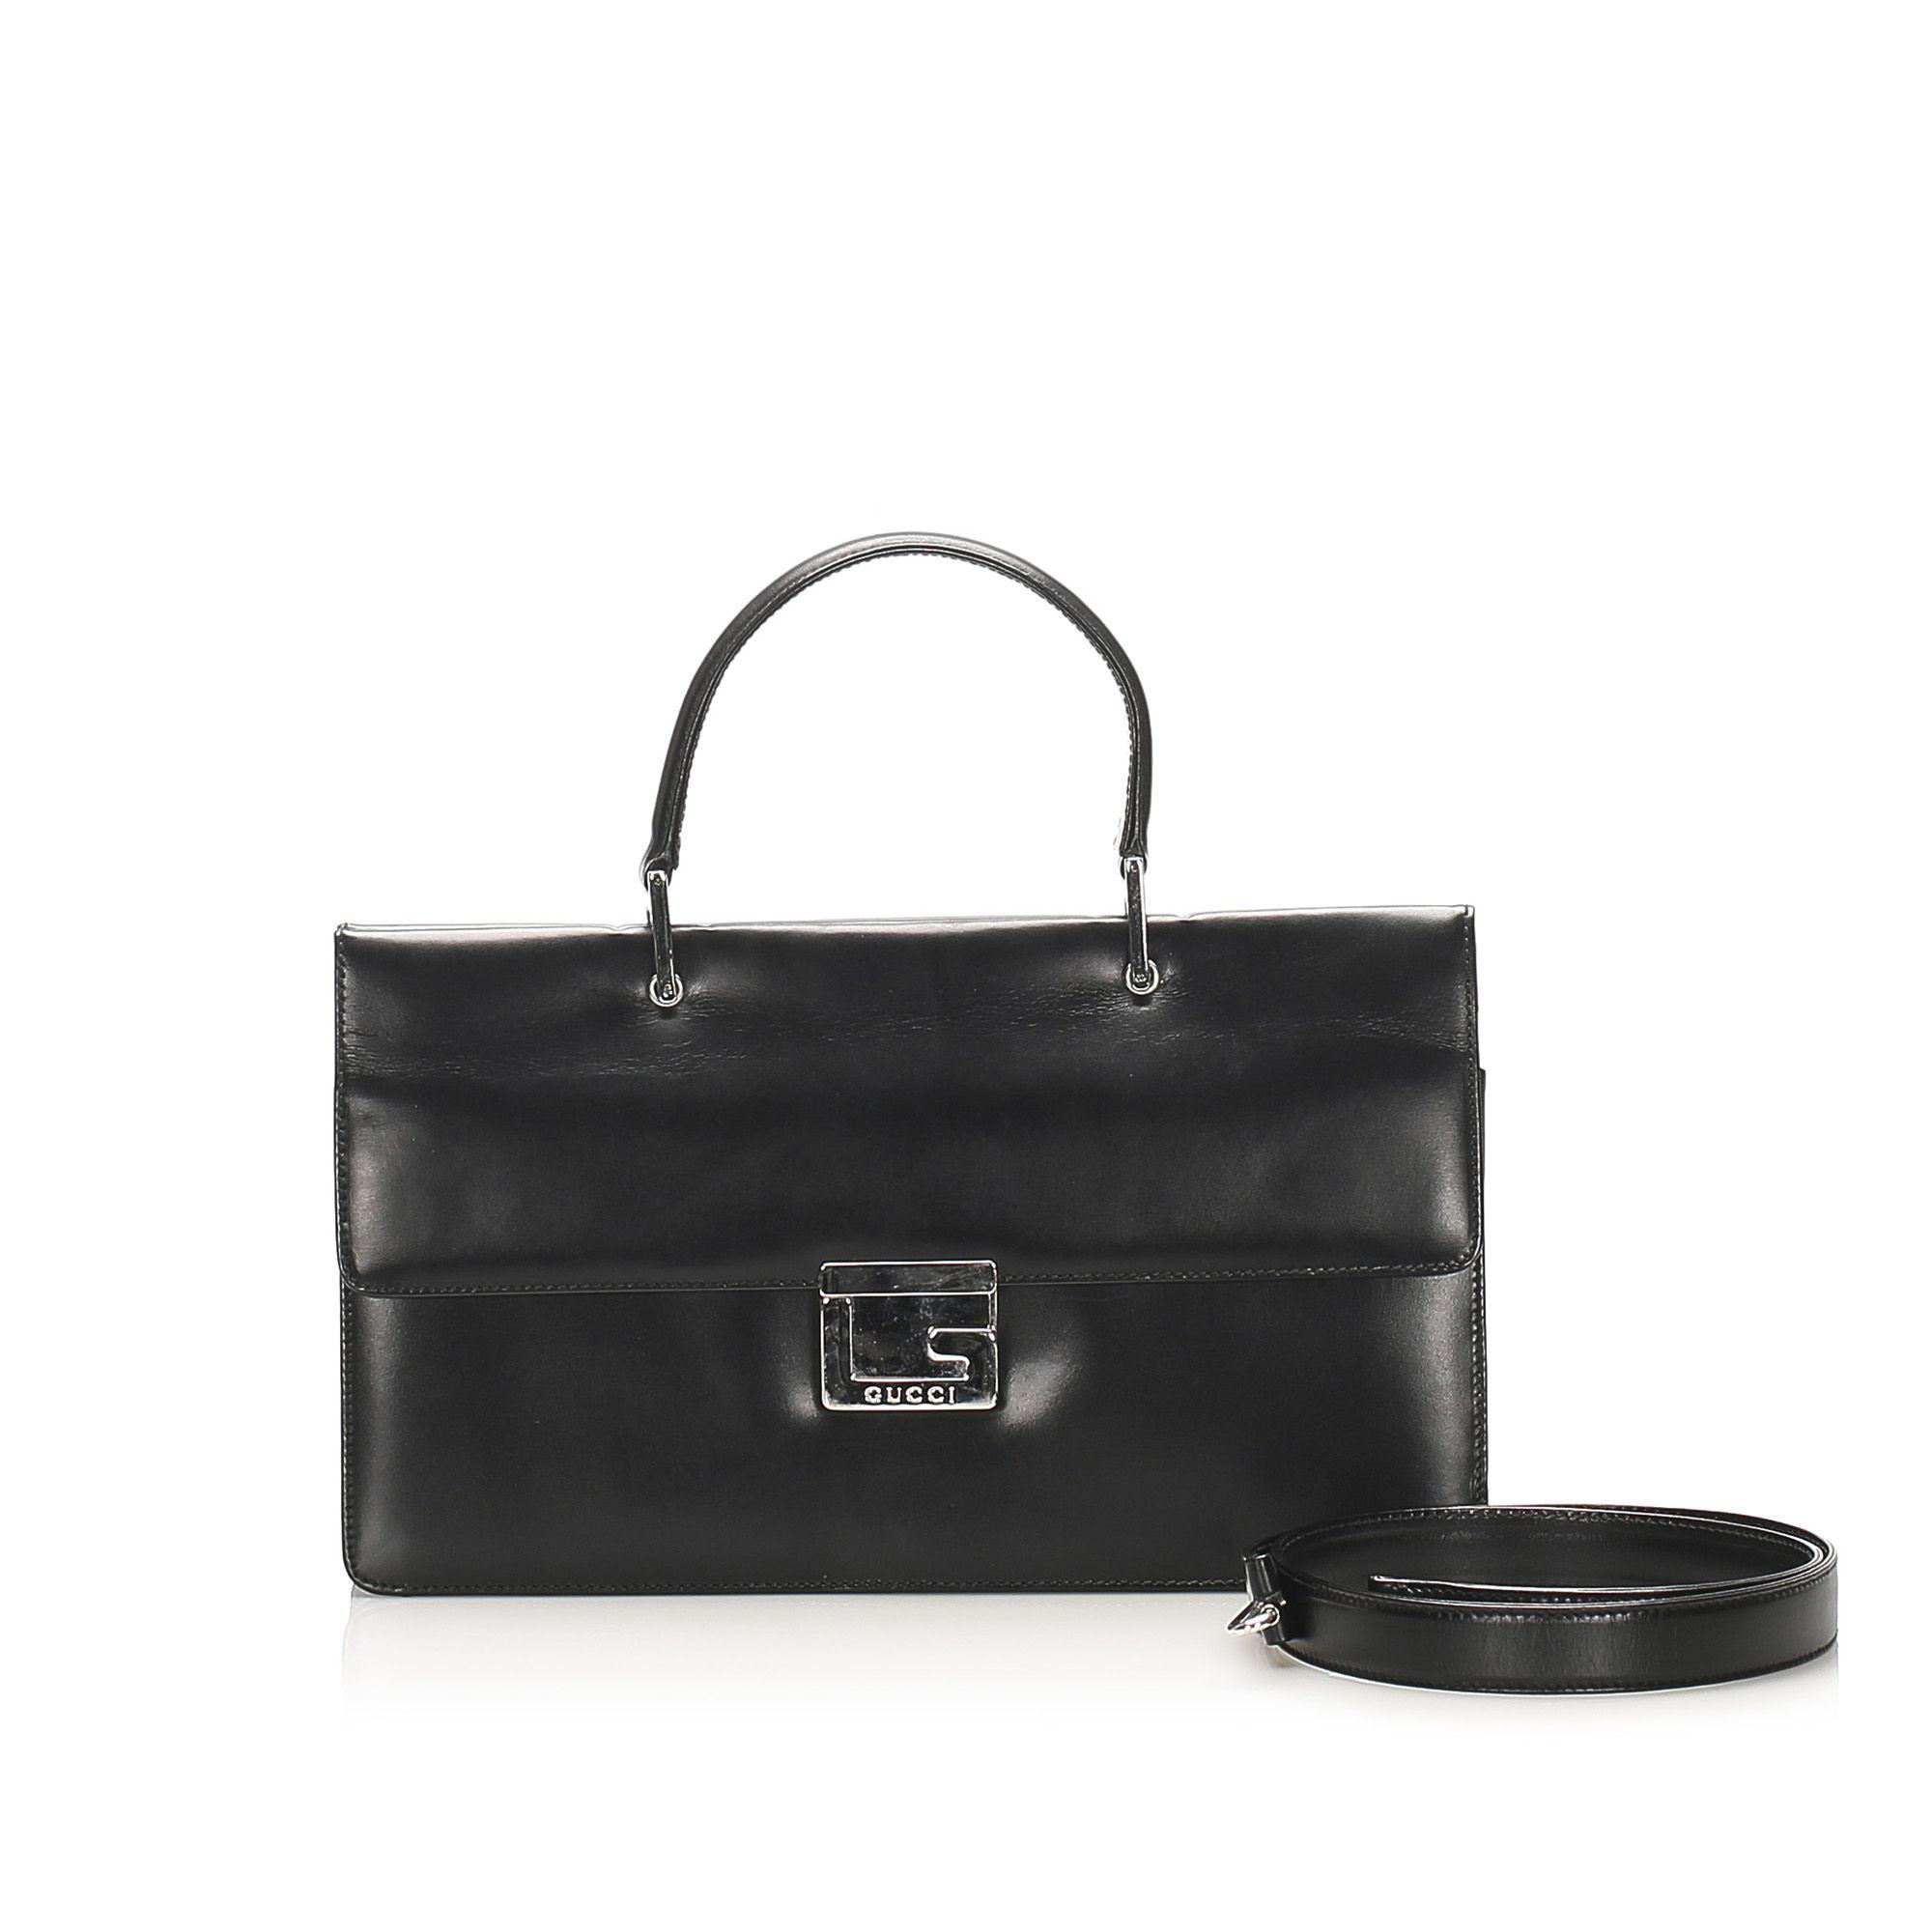 Vintage Gucci Leather Satchel Black